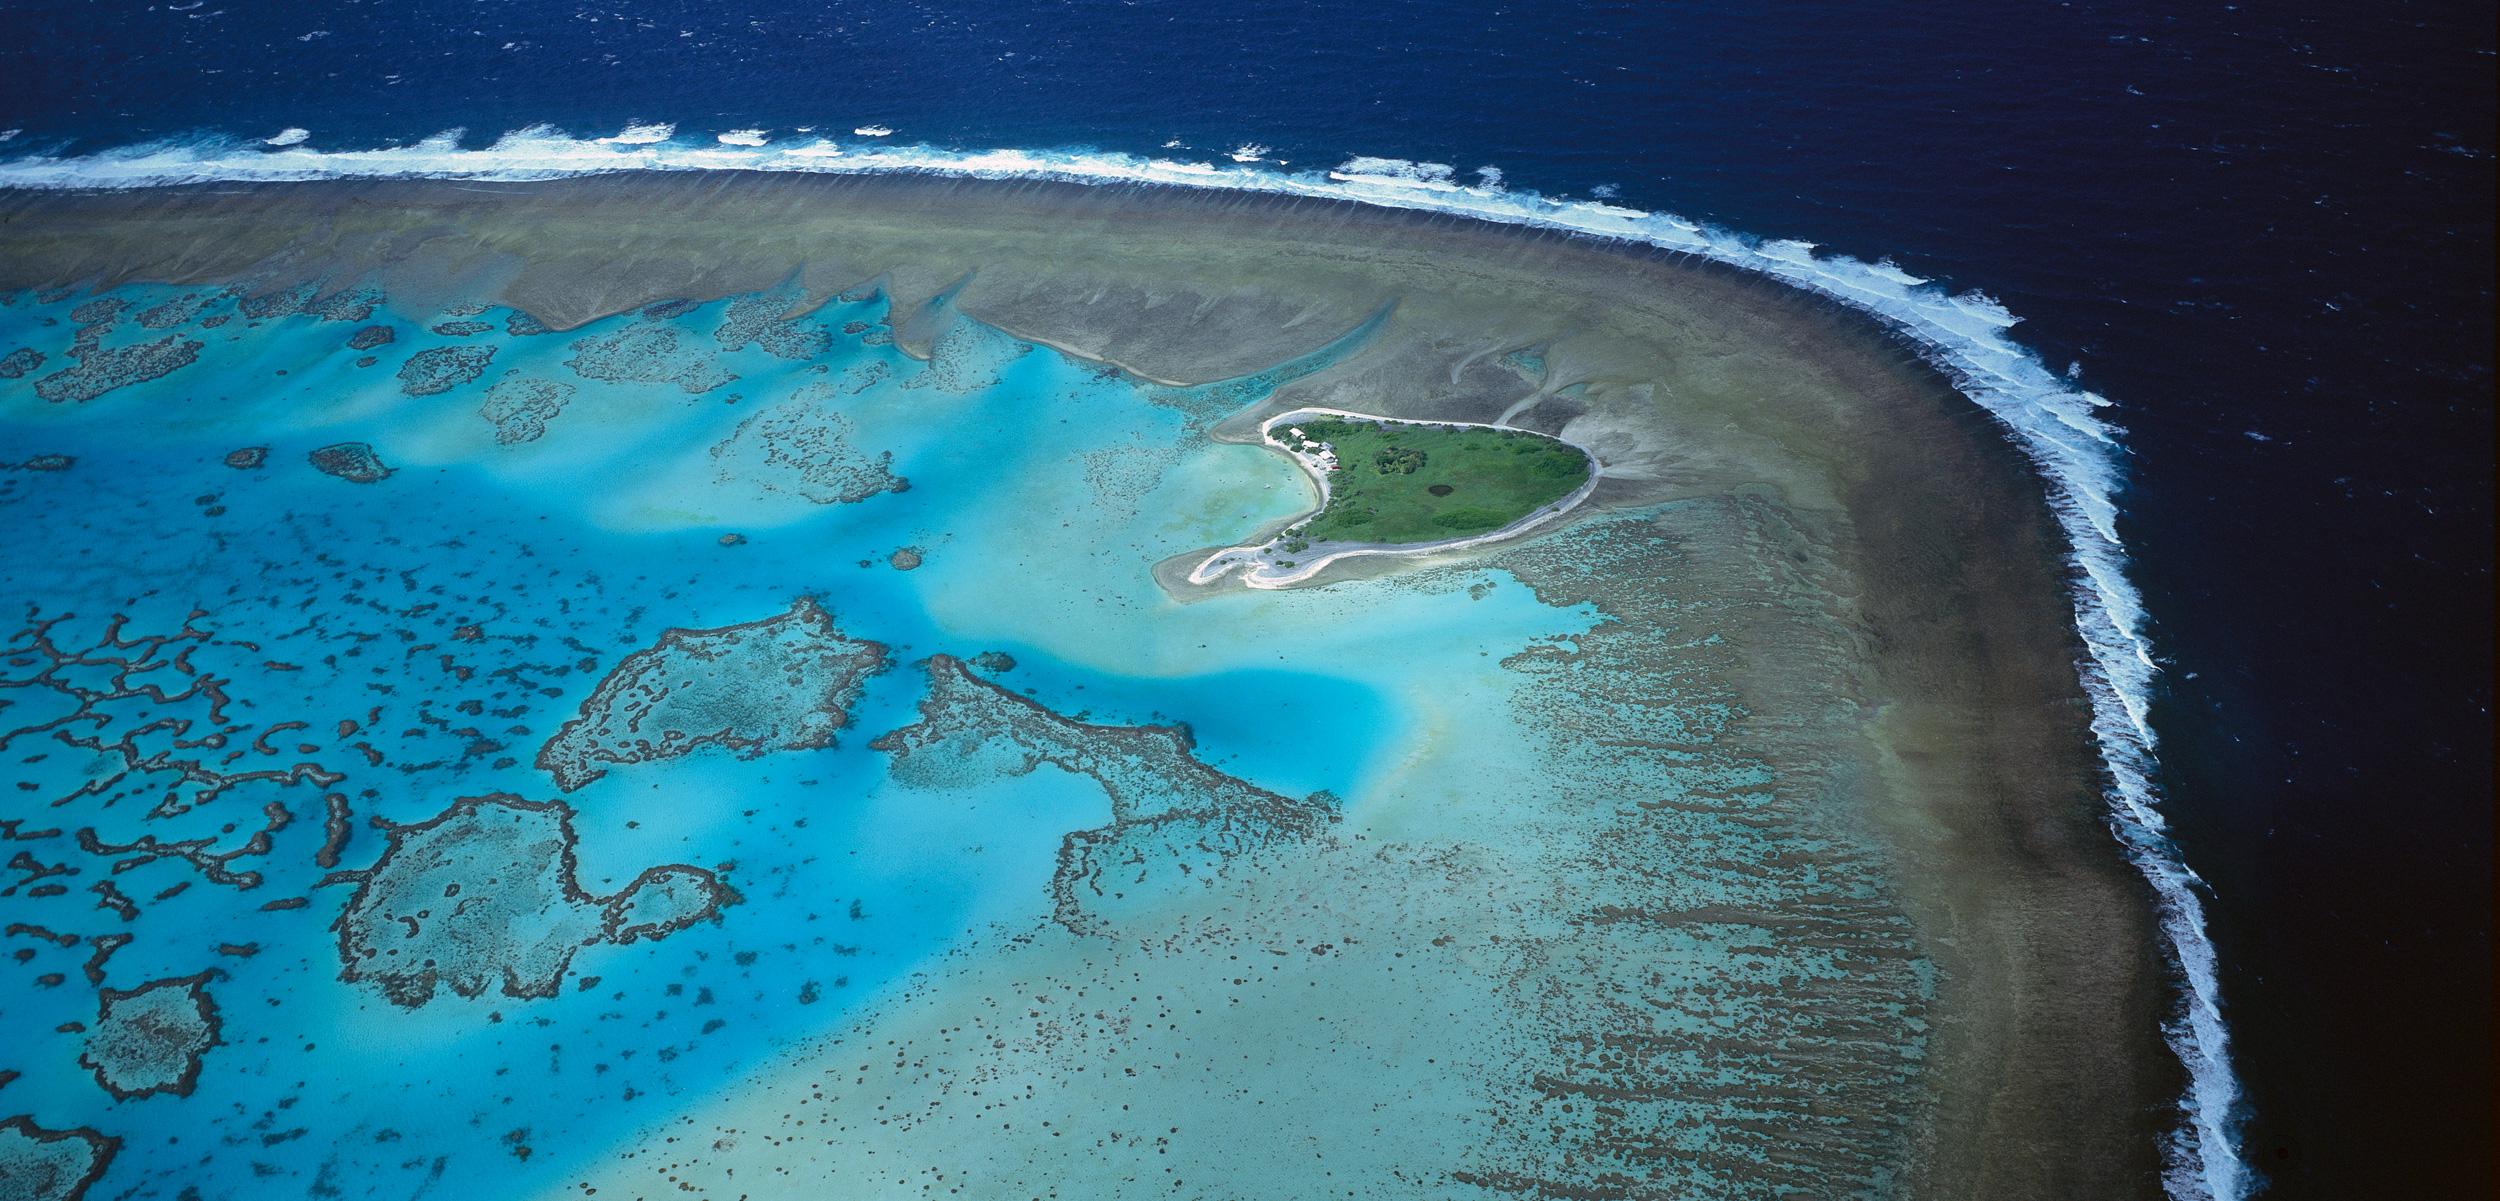 One Tree Island and reef, Capricorn-Bunker group, Great Barrier Reef Marine Park, Queensland, Australia